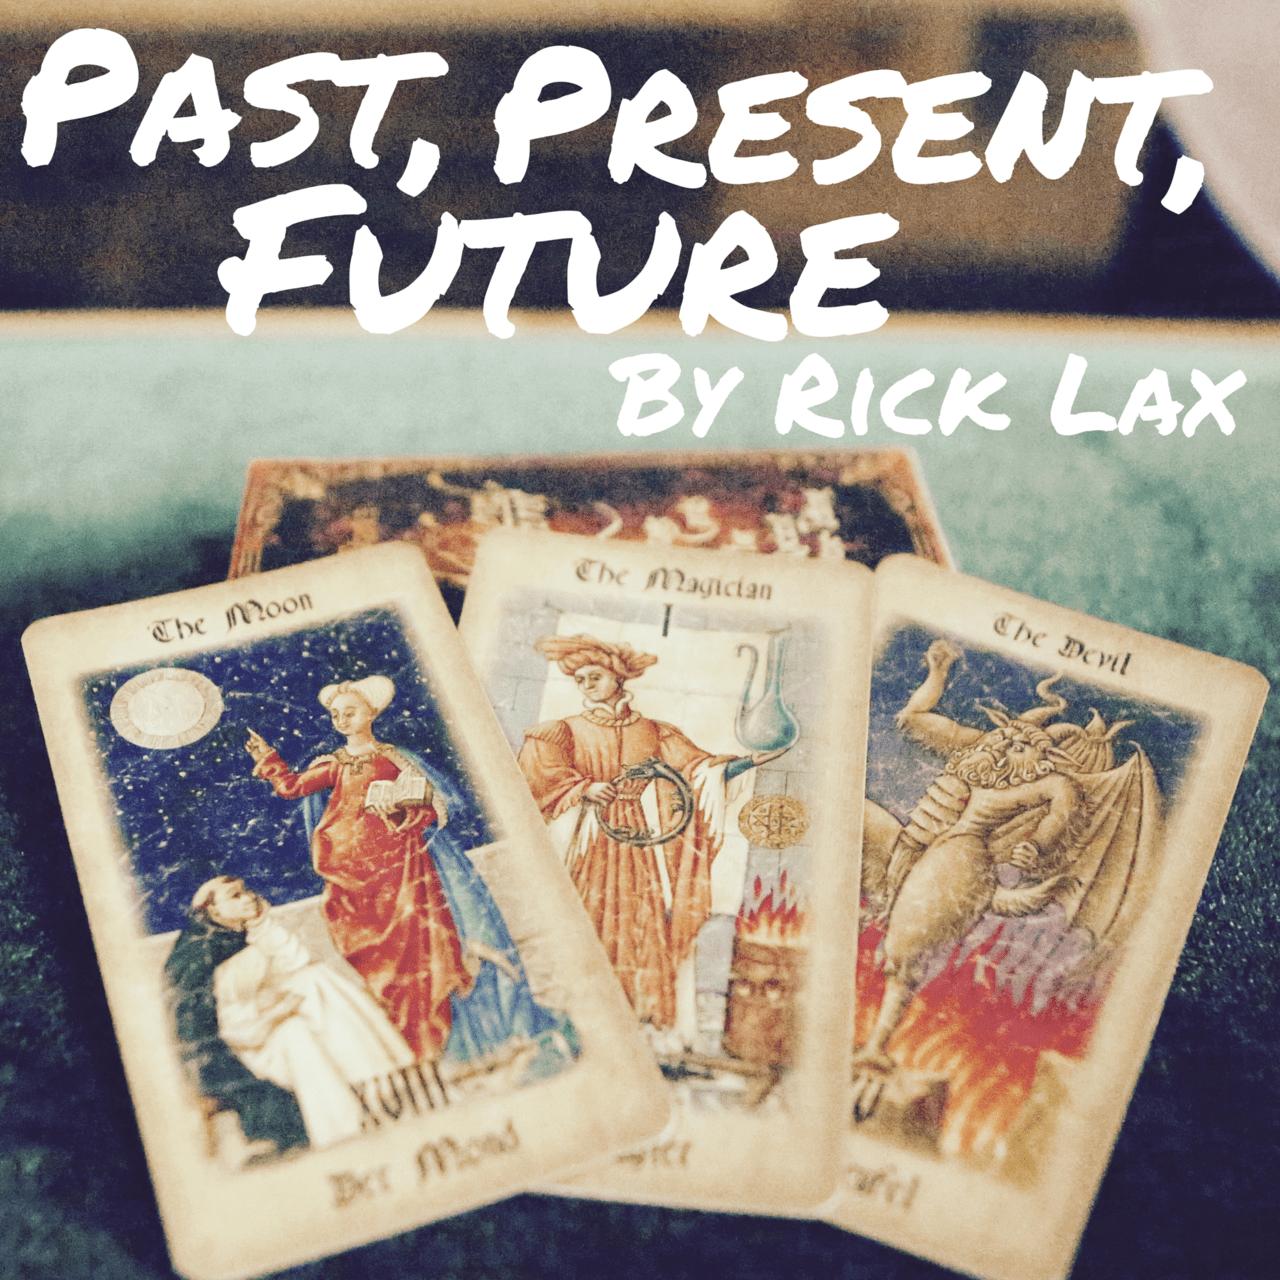 Past Present Future by Rick Lax